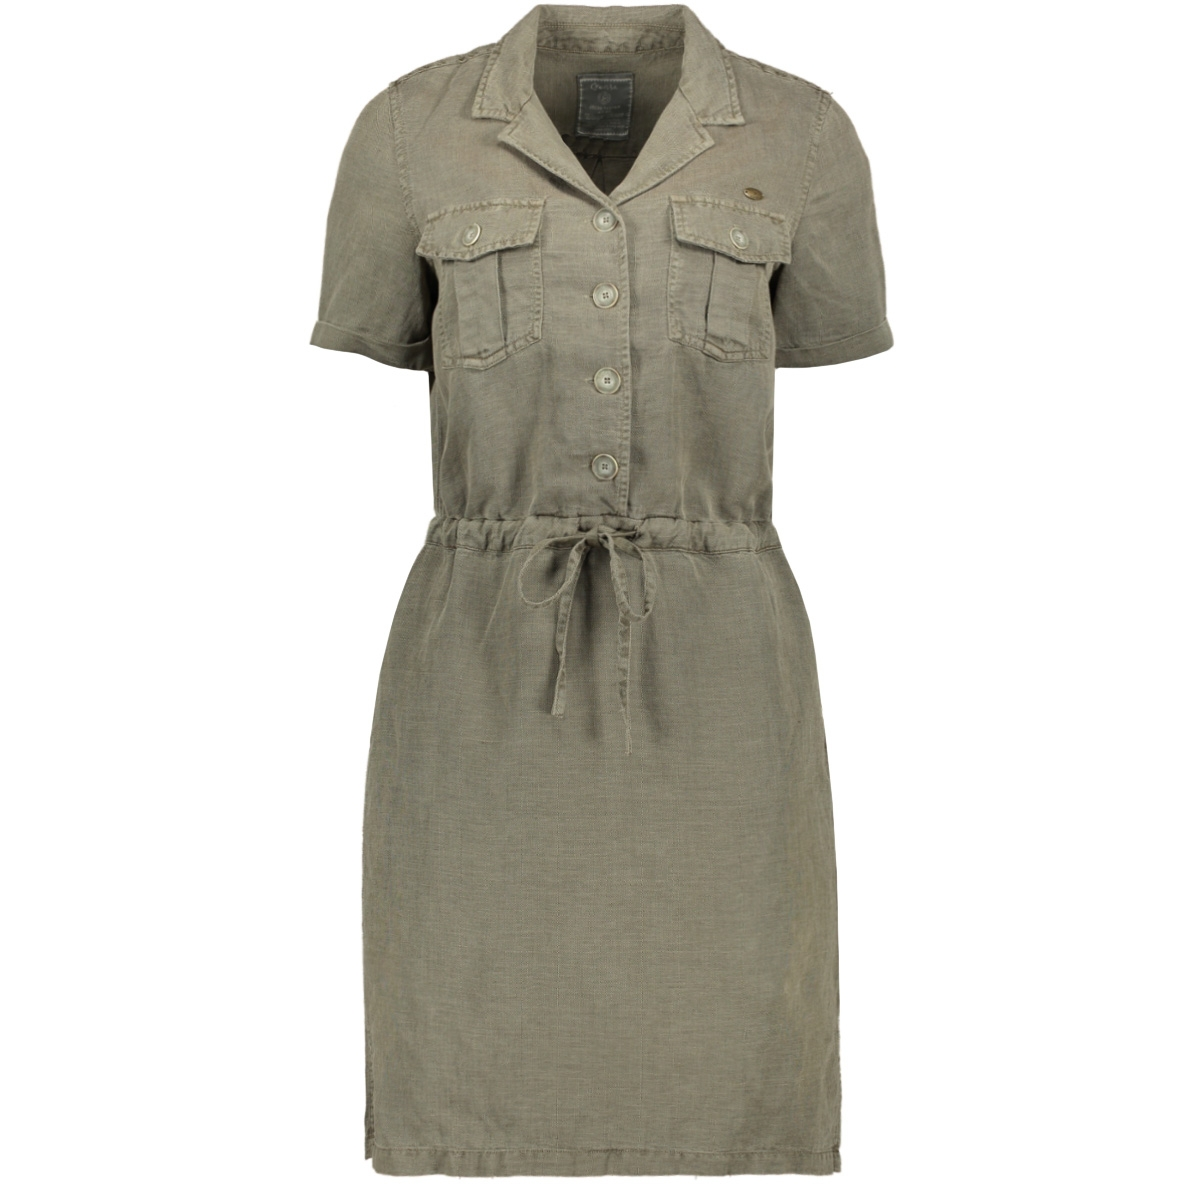 dress lyocell chest pockets 07017 10 geisha jurk 000550 army